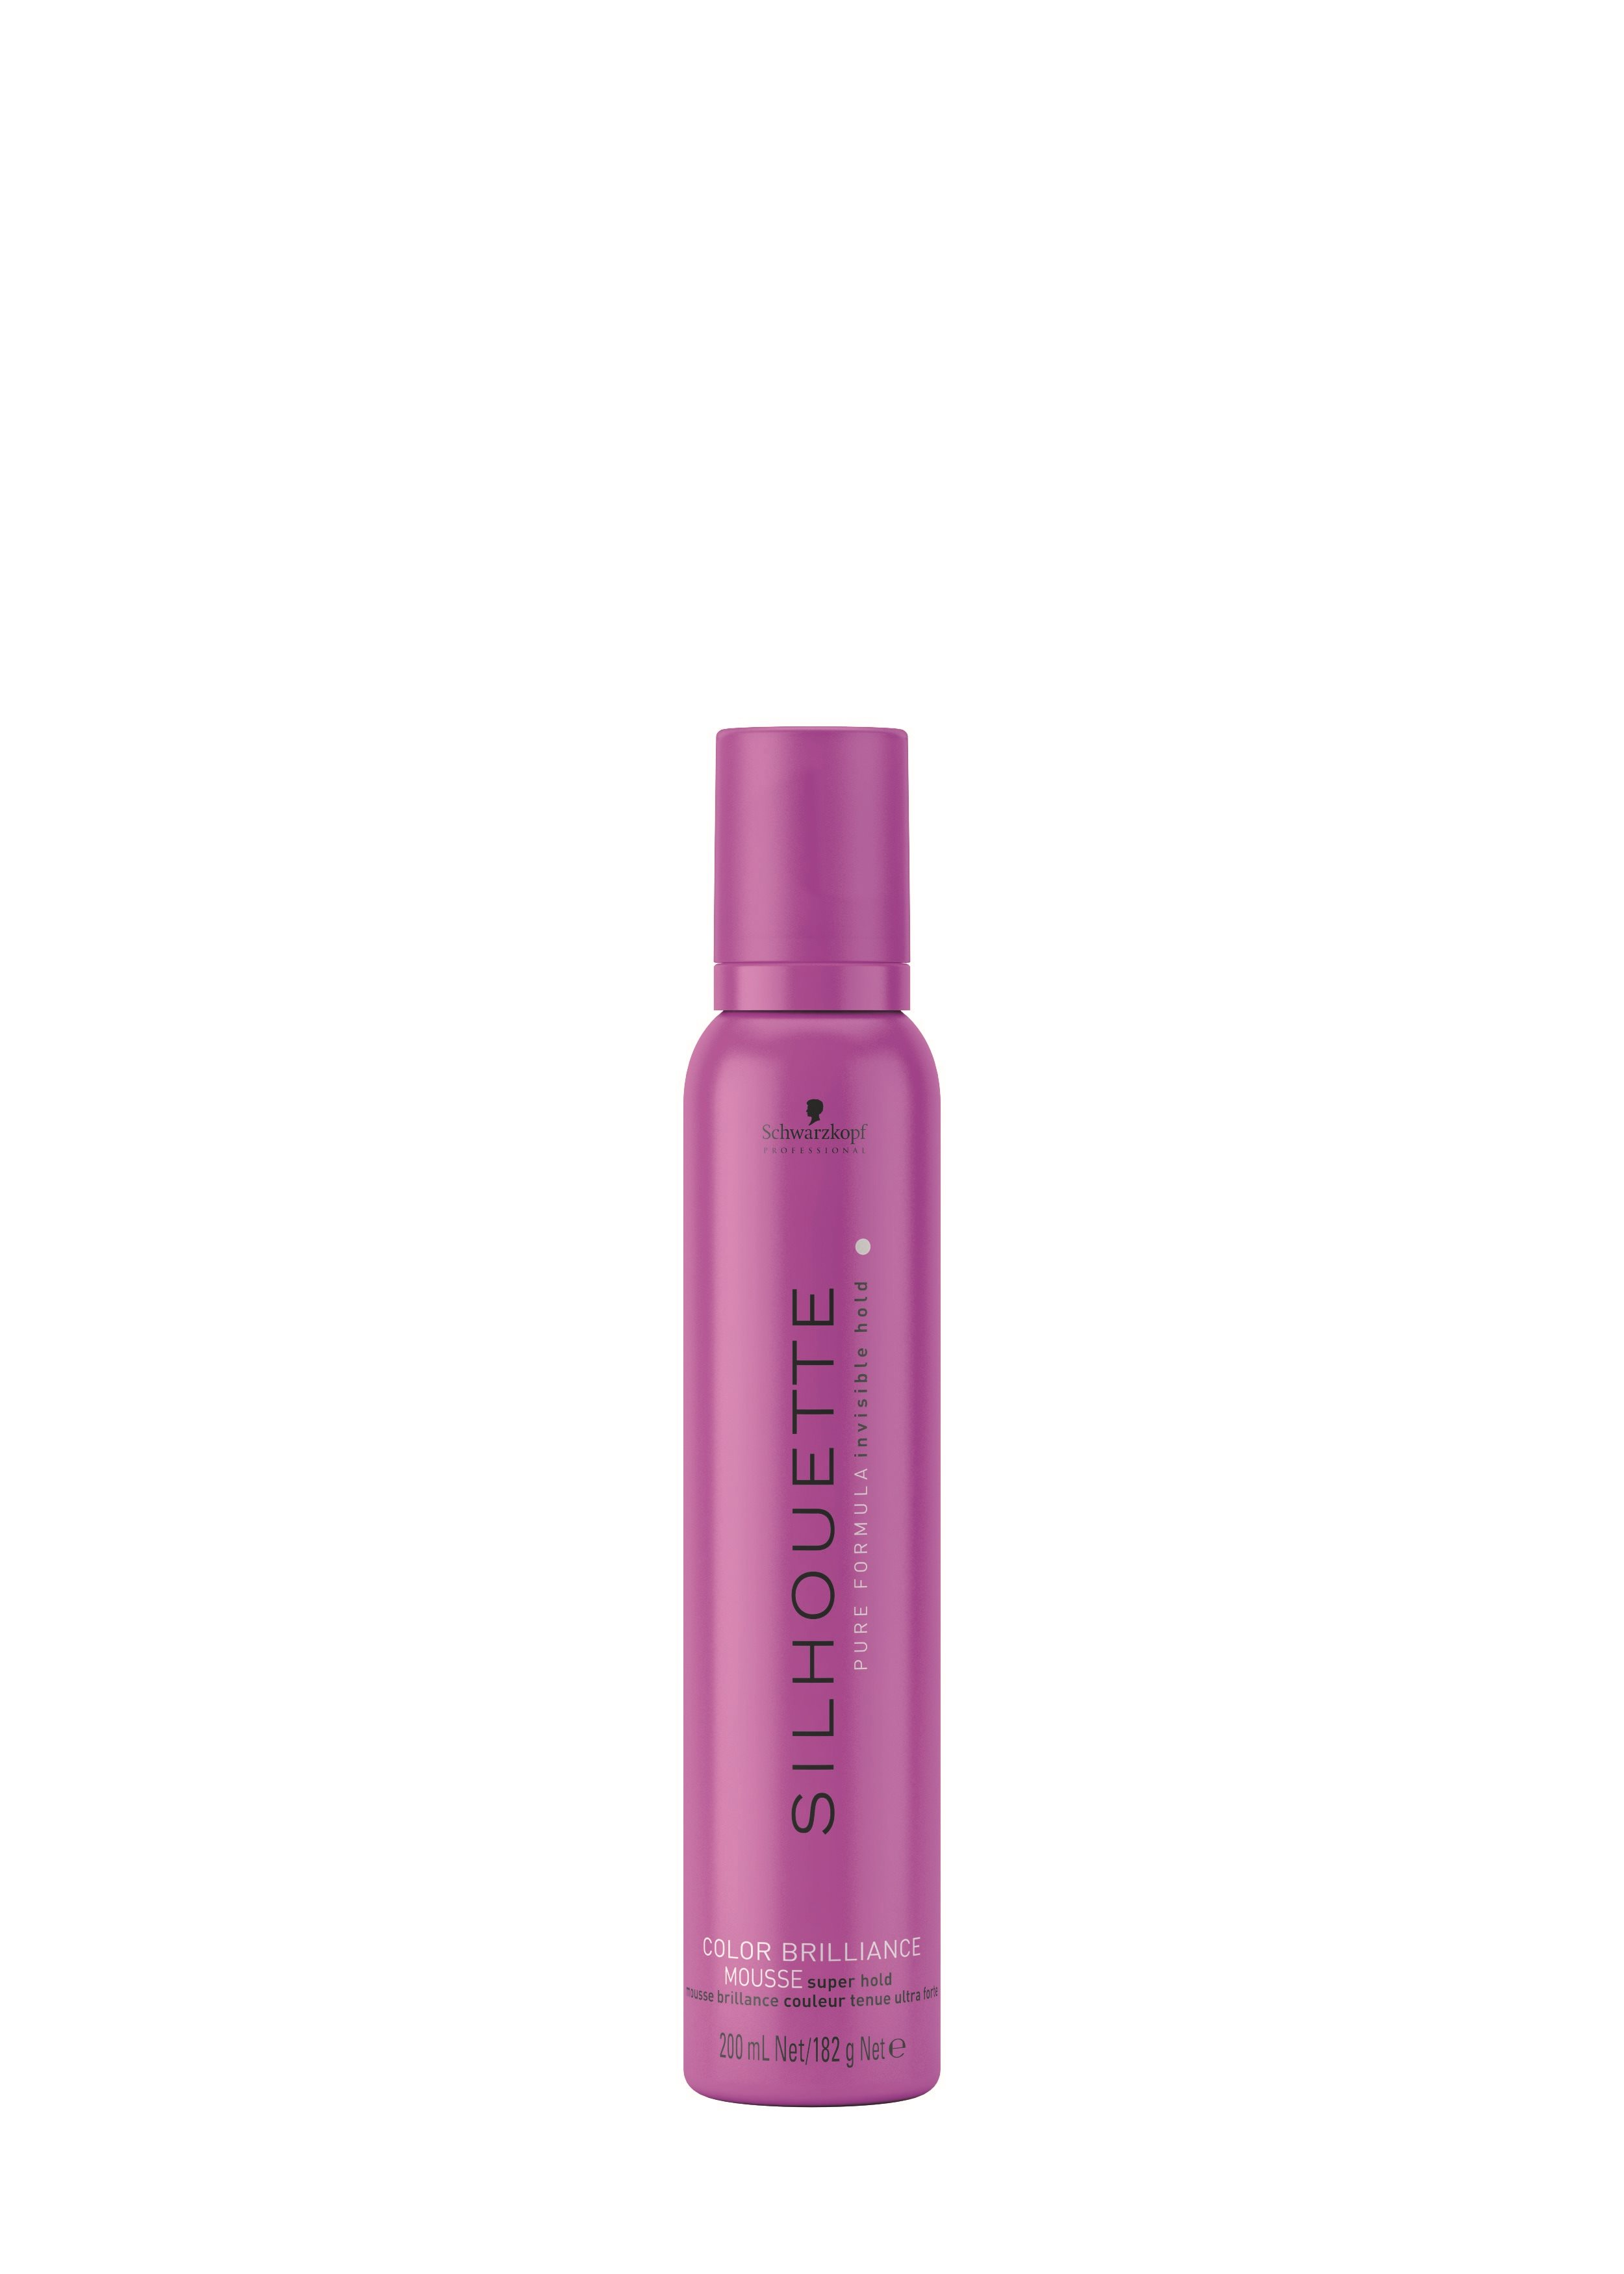 SCHWARZKOPF Professional Silhouette Colour Brilliance Mousse 500 ml